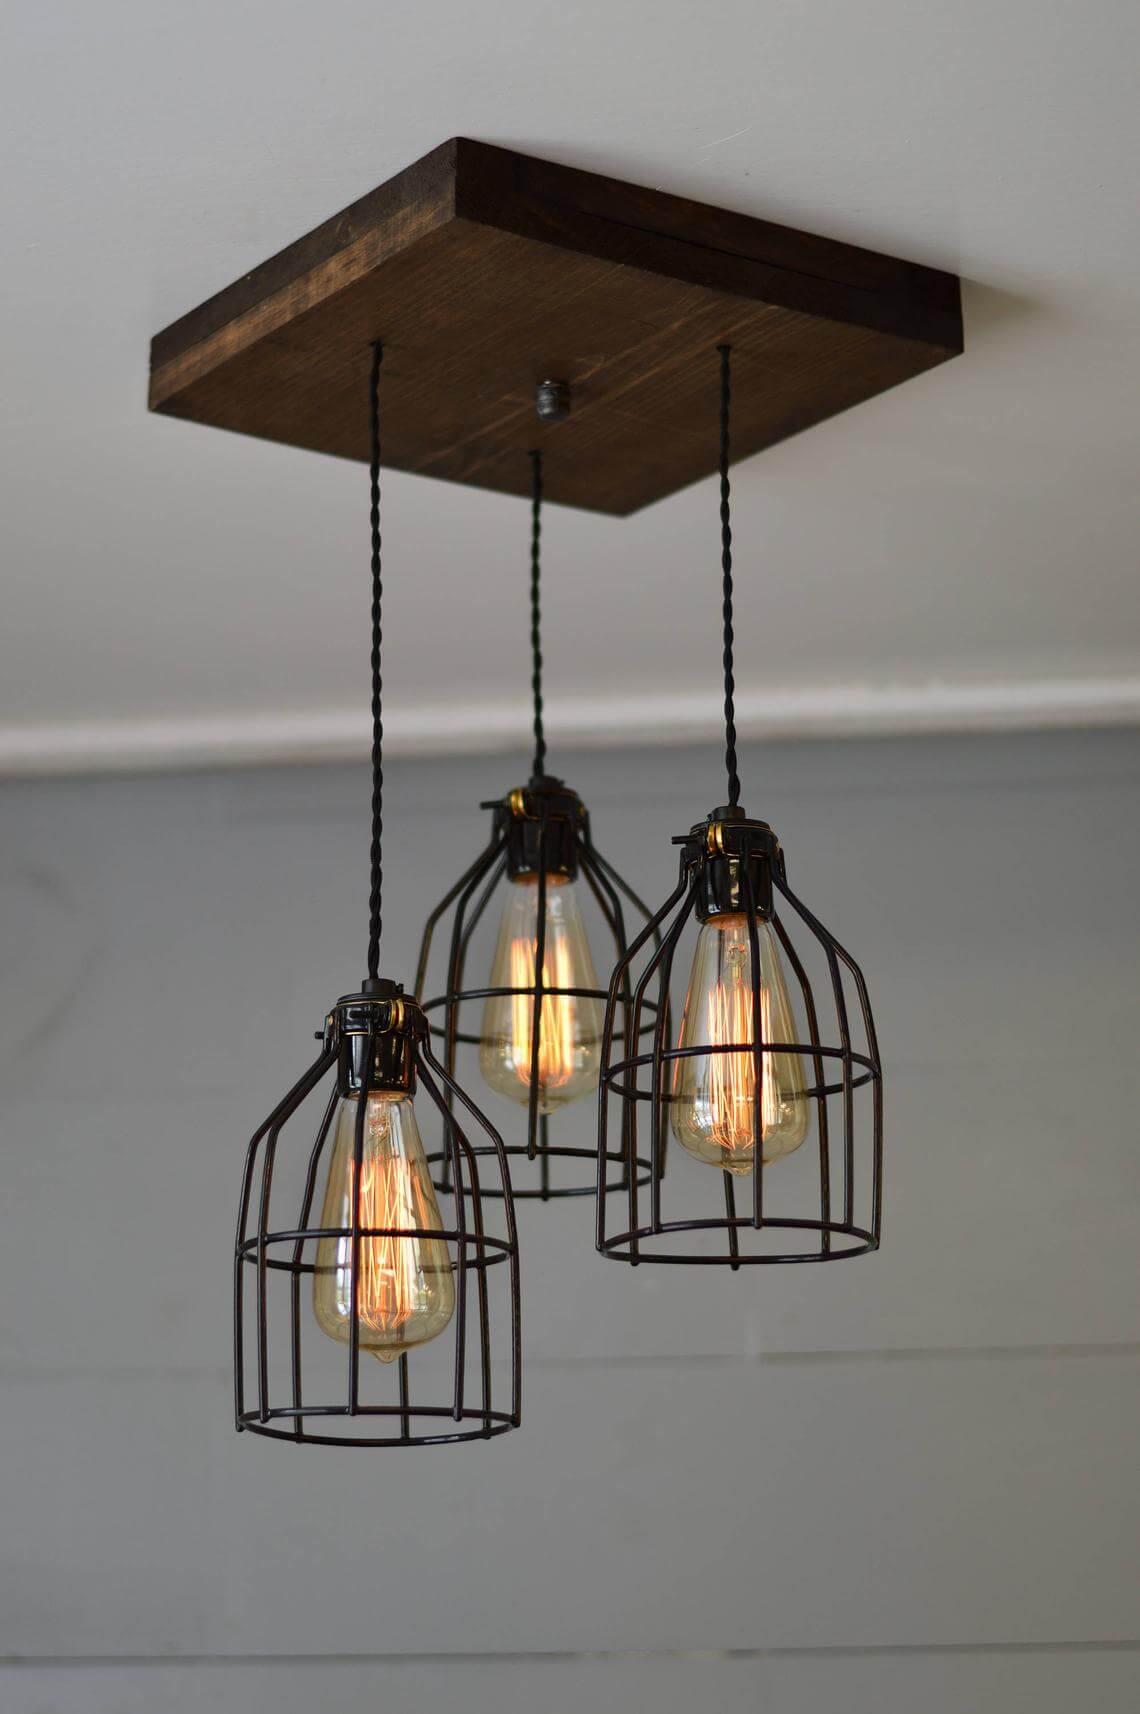 Triple Pendant Wooden Farmhouse Chandelier